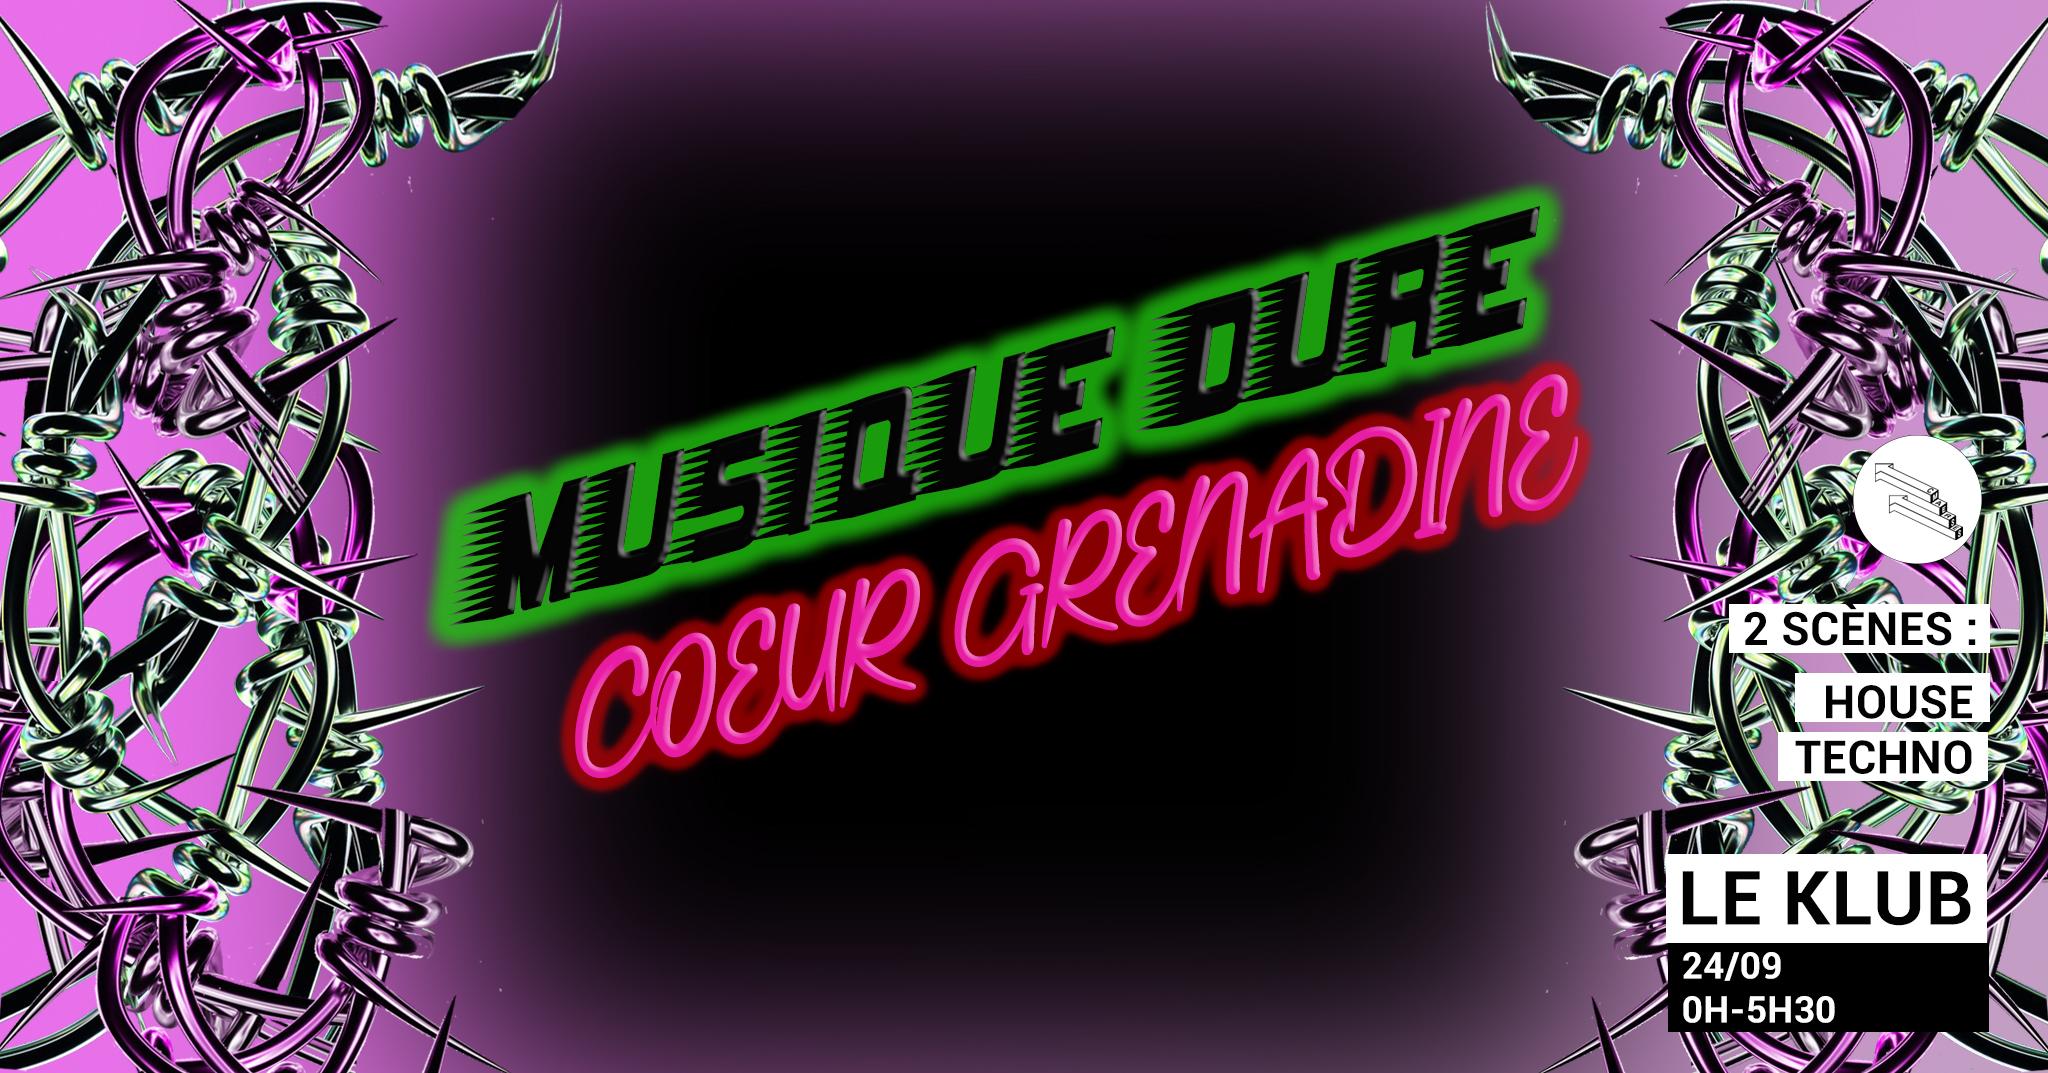 Musique Dure Coeur Grenadine #2